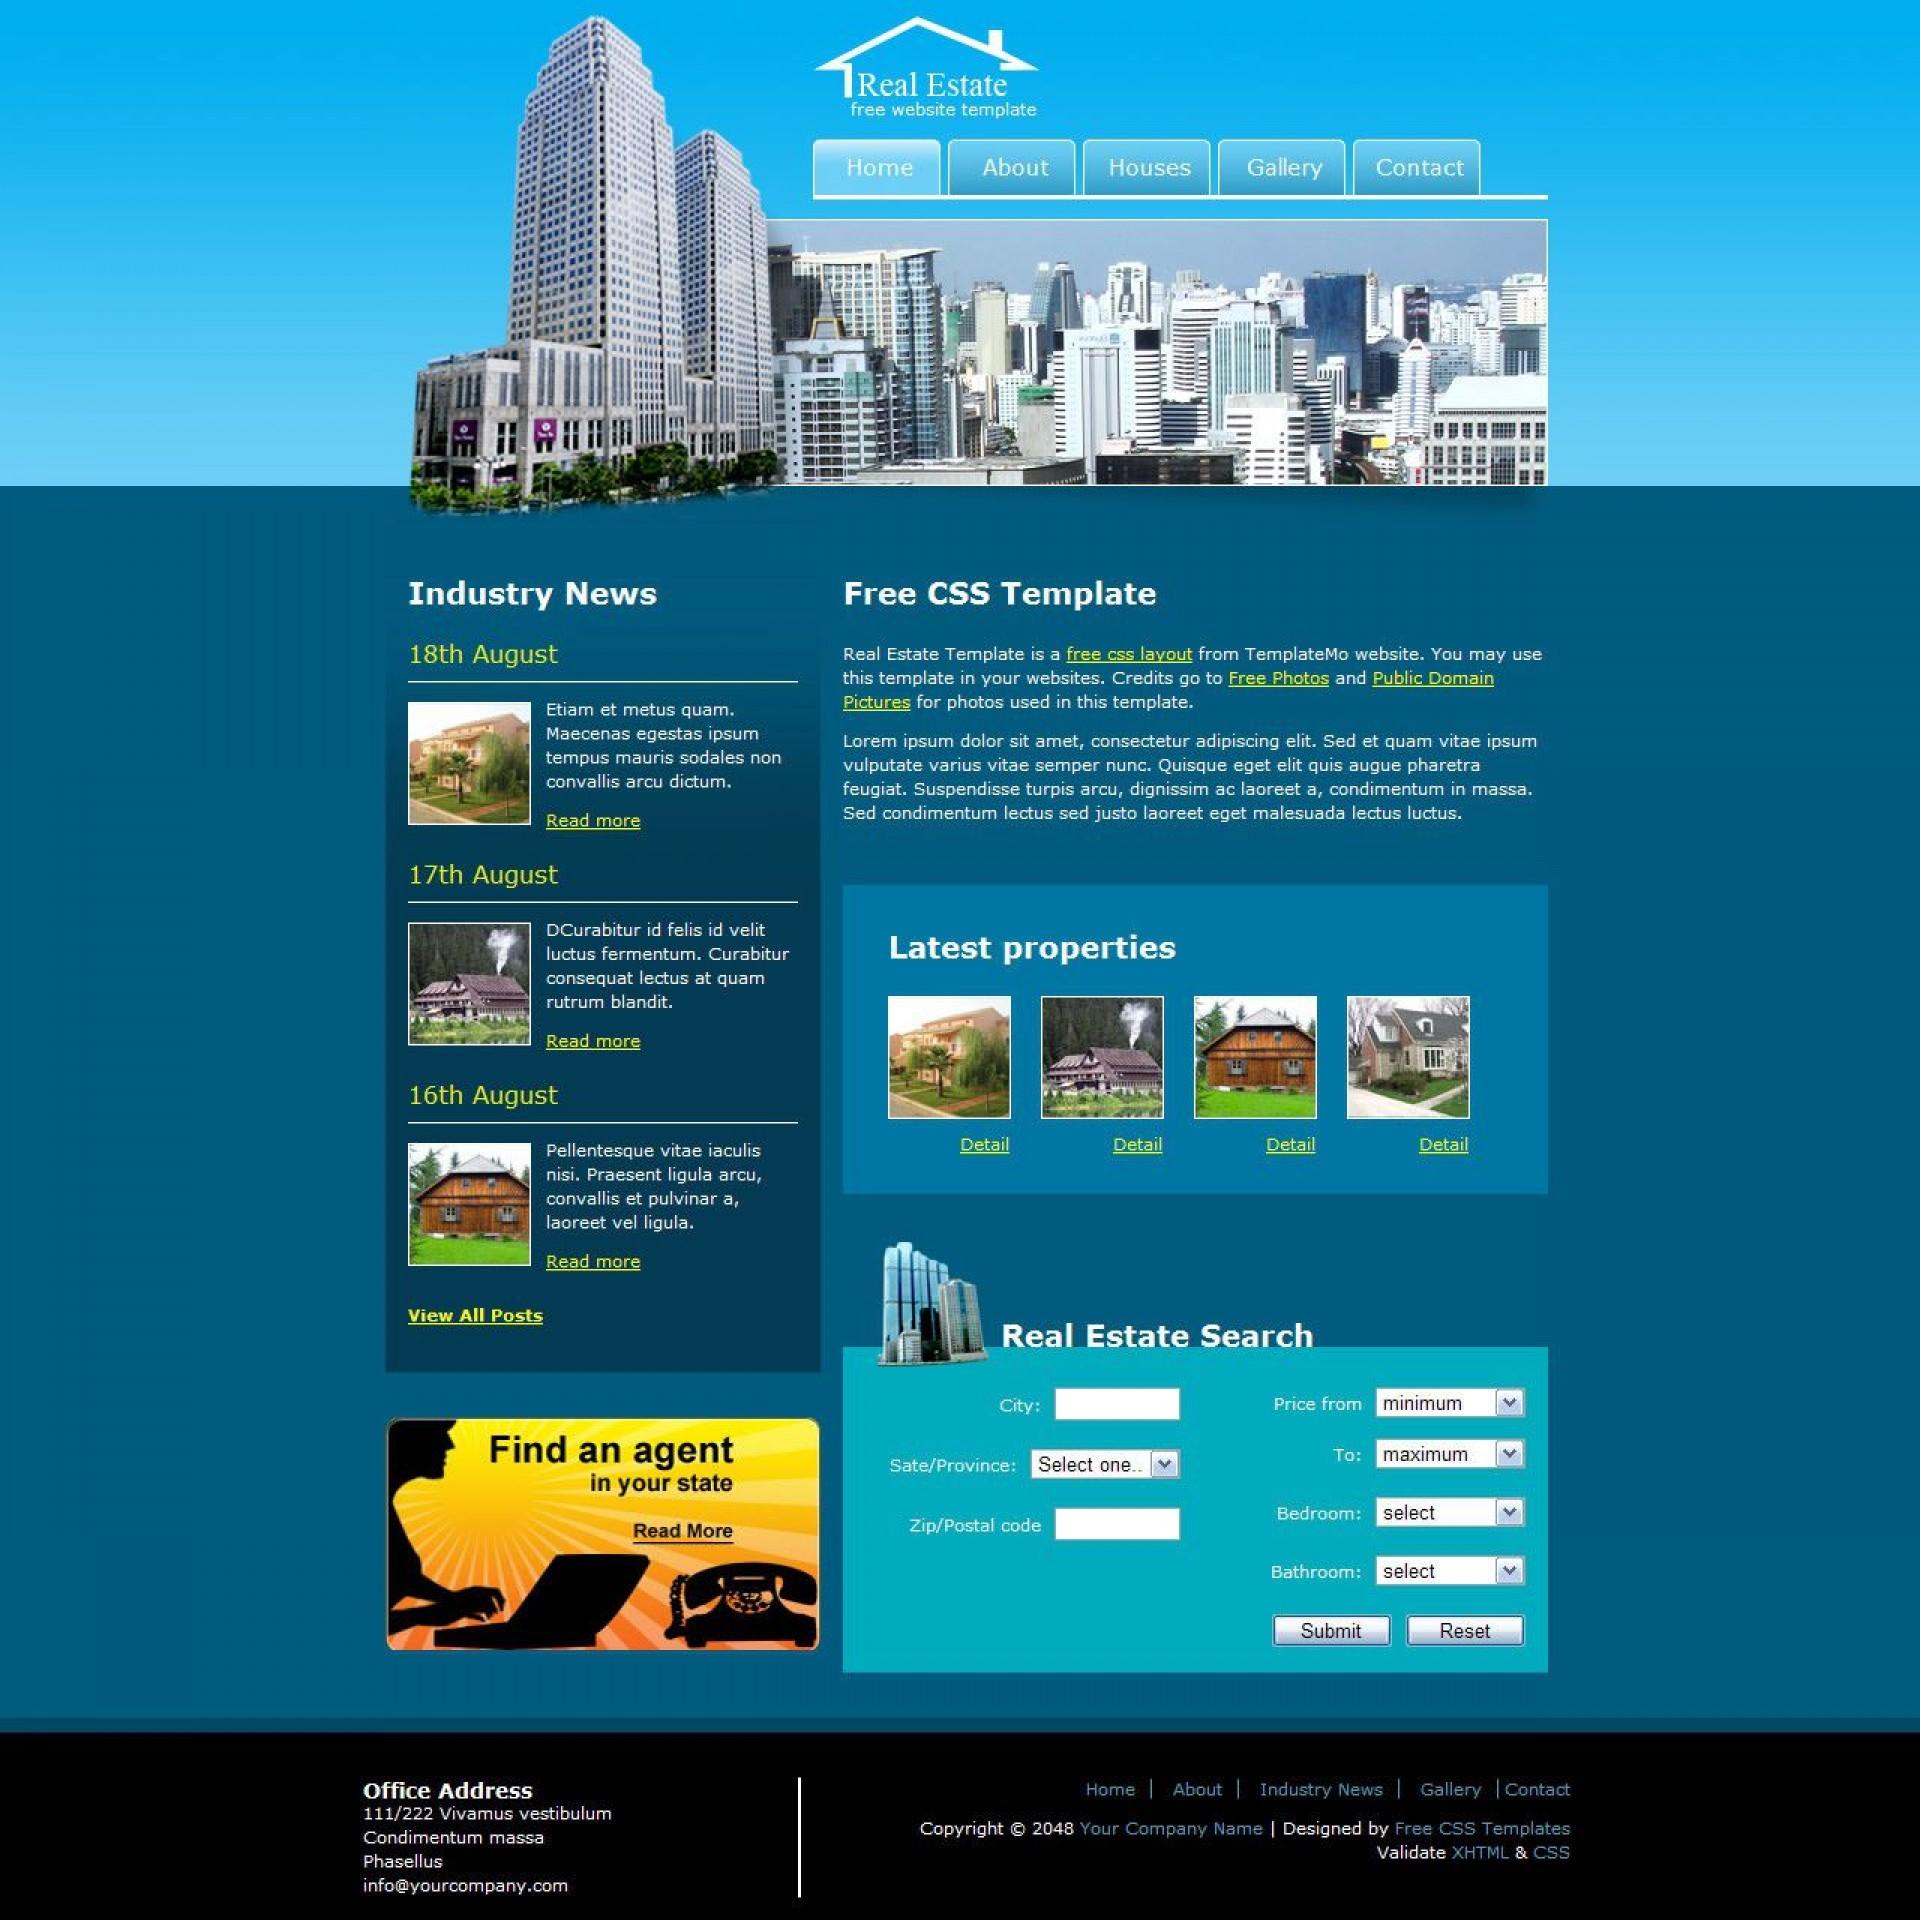 008 Impressive Free Real Estate Template High Definition  Website Download Bootstrap 41920